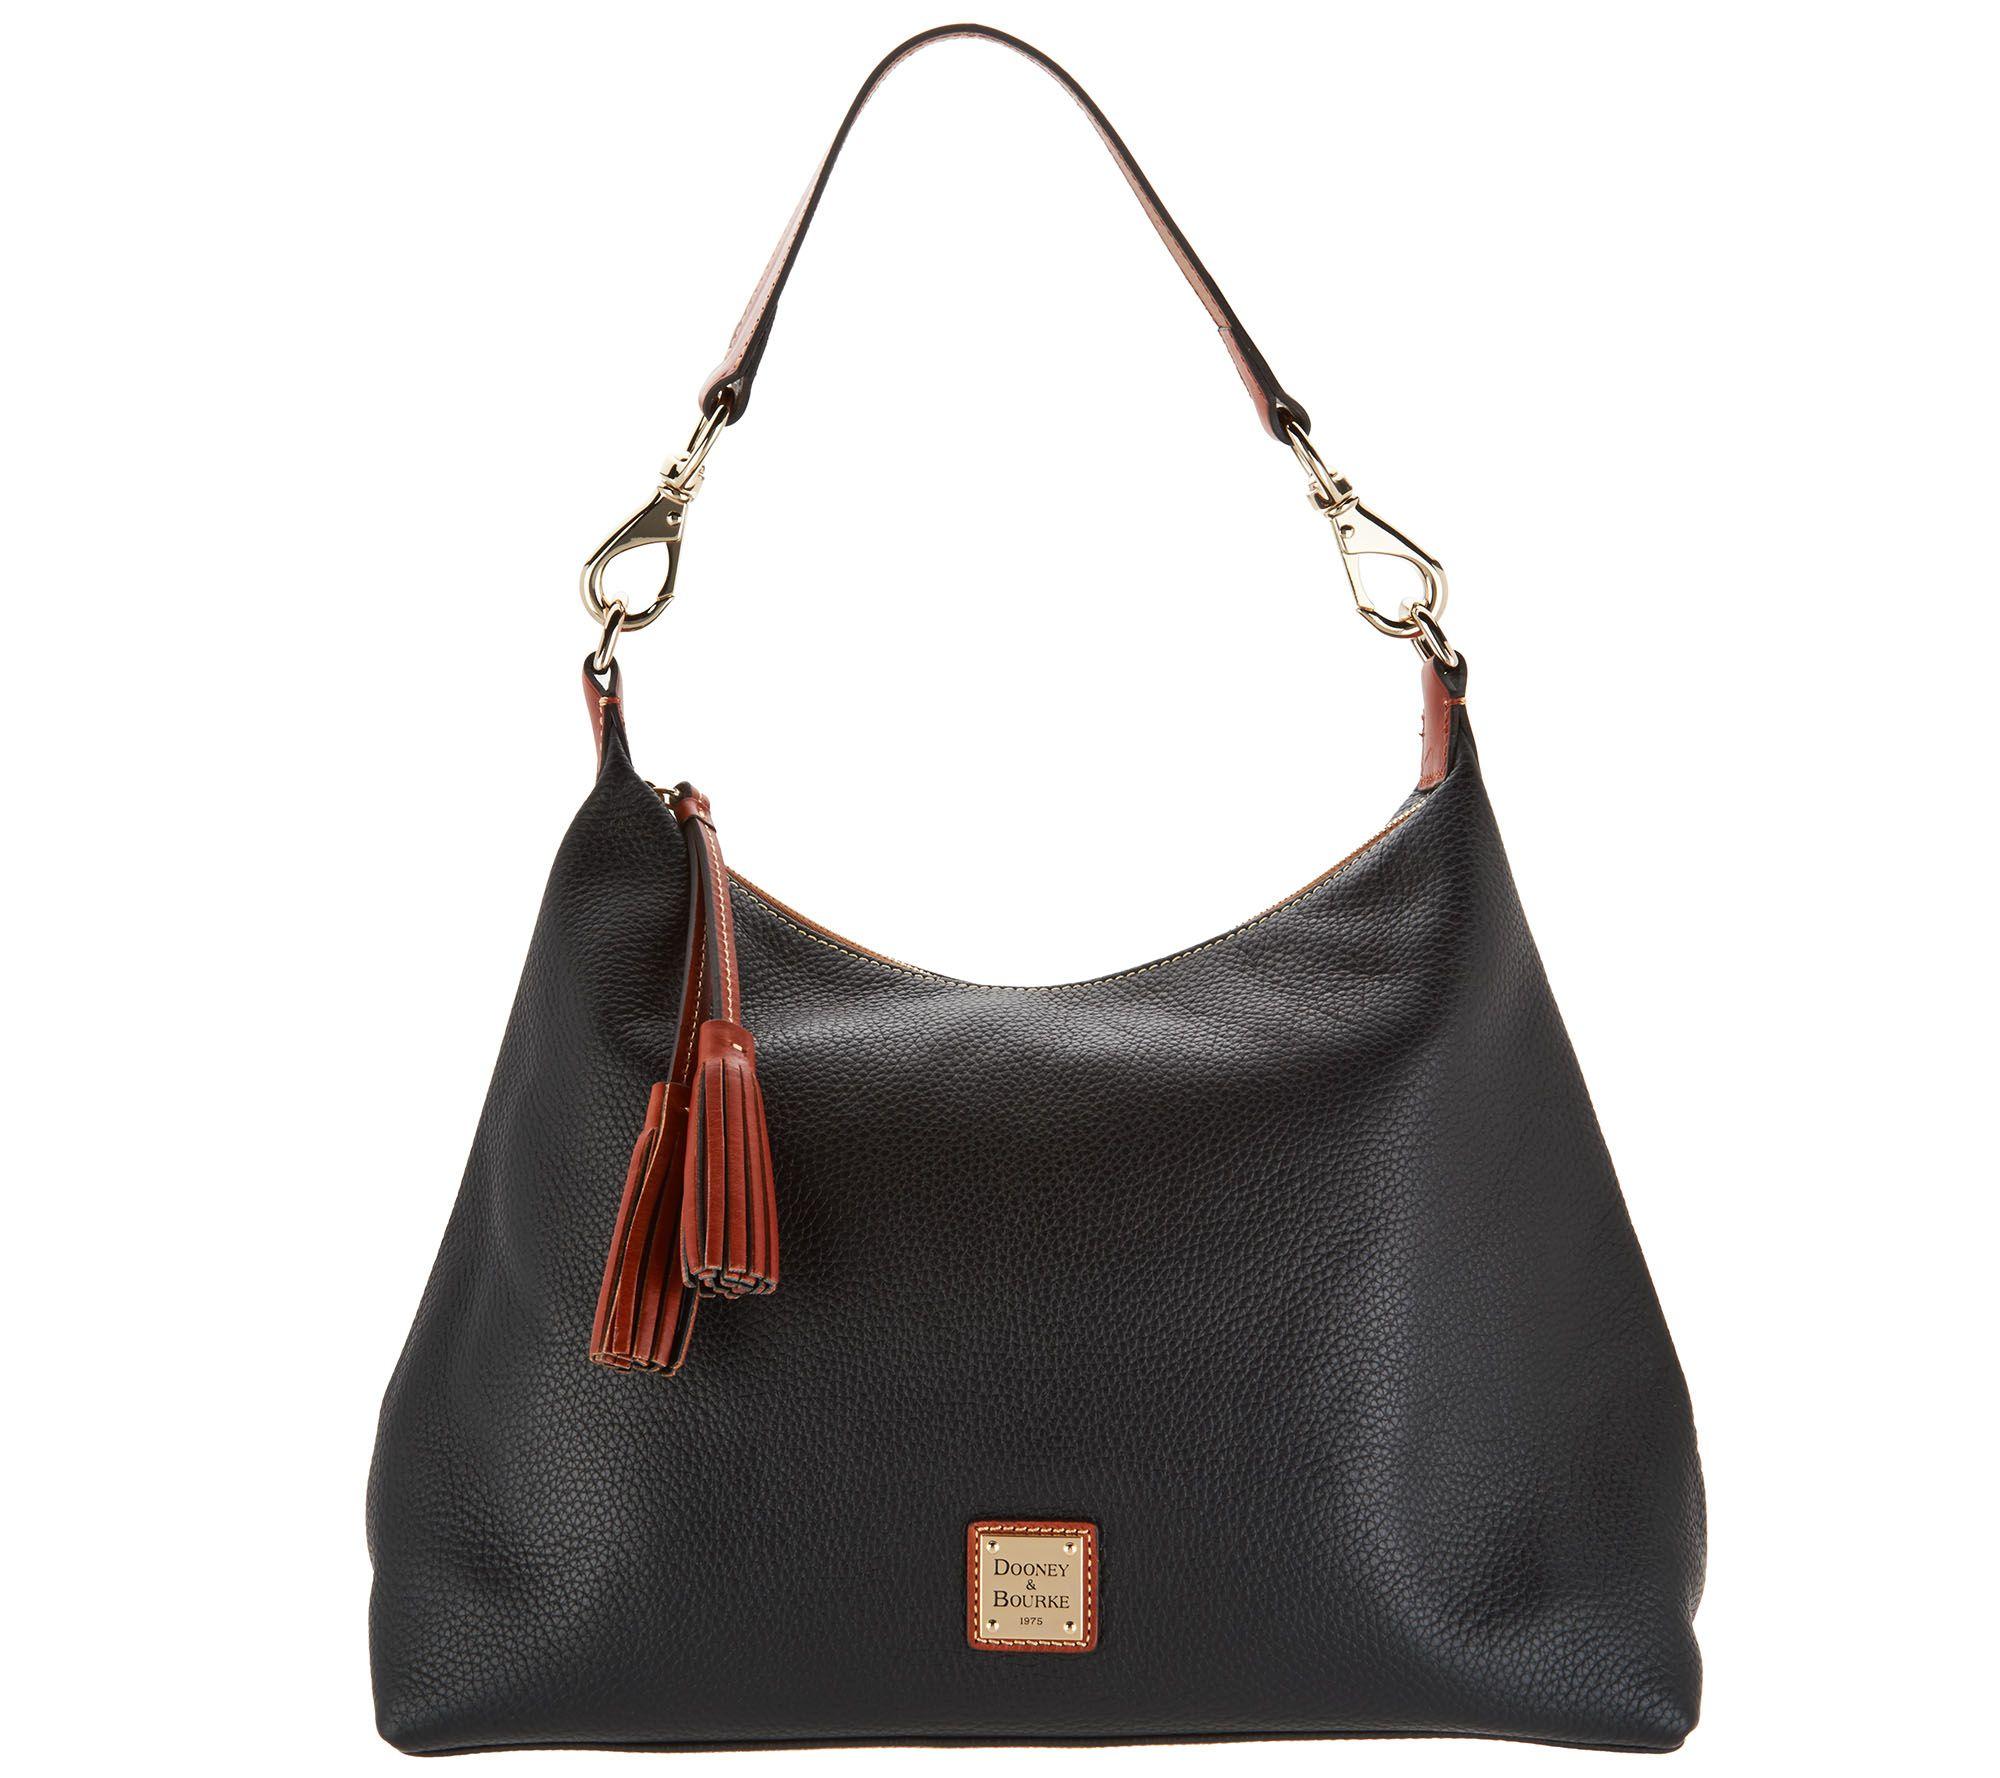 22212ecb4ce0 Dooney & Bourke Pebble Leather Hobo Handbag -Juliette - Page 1 — QVC.com